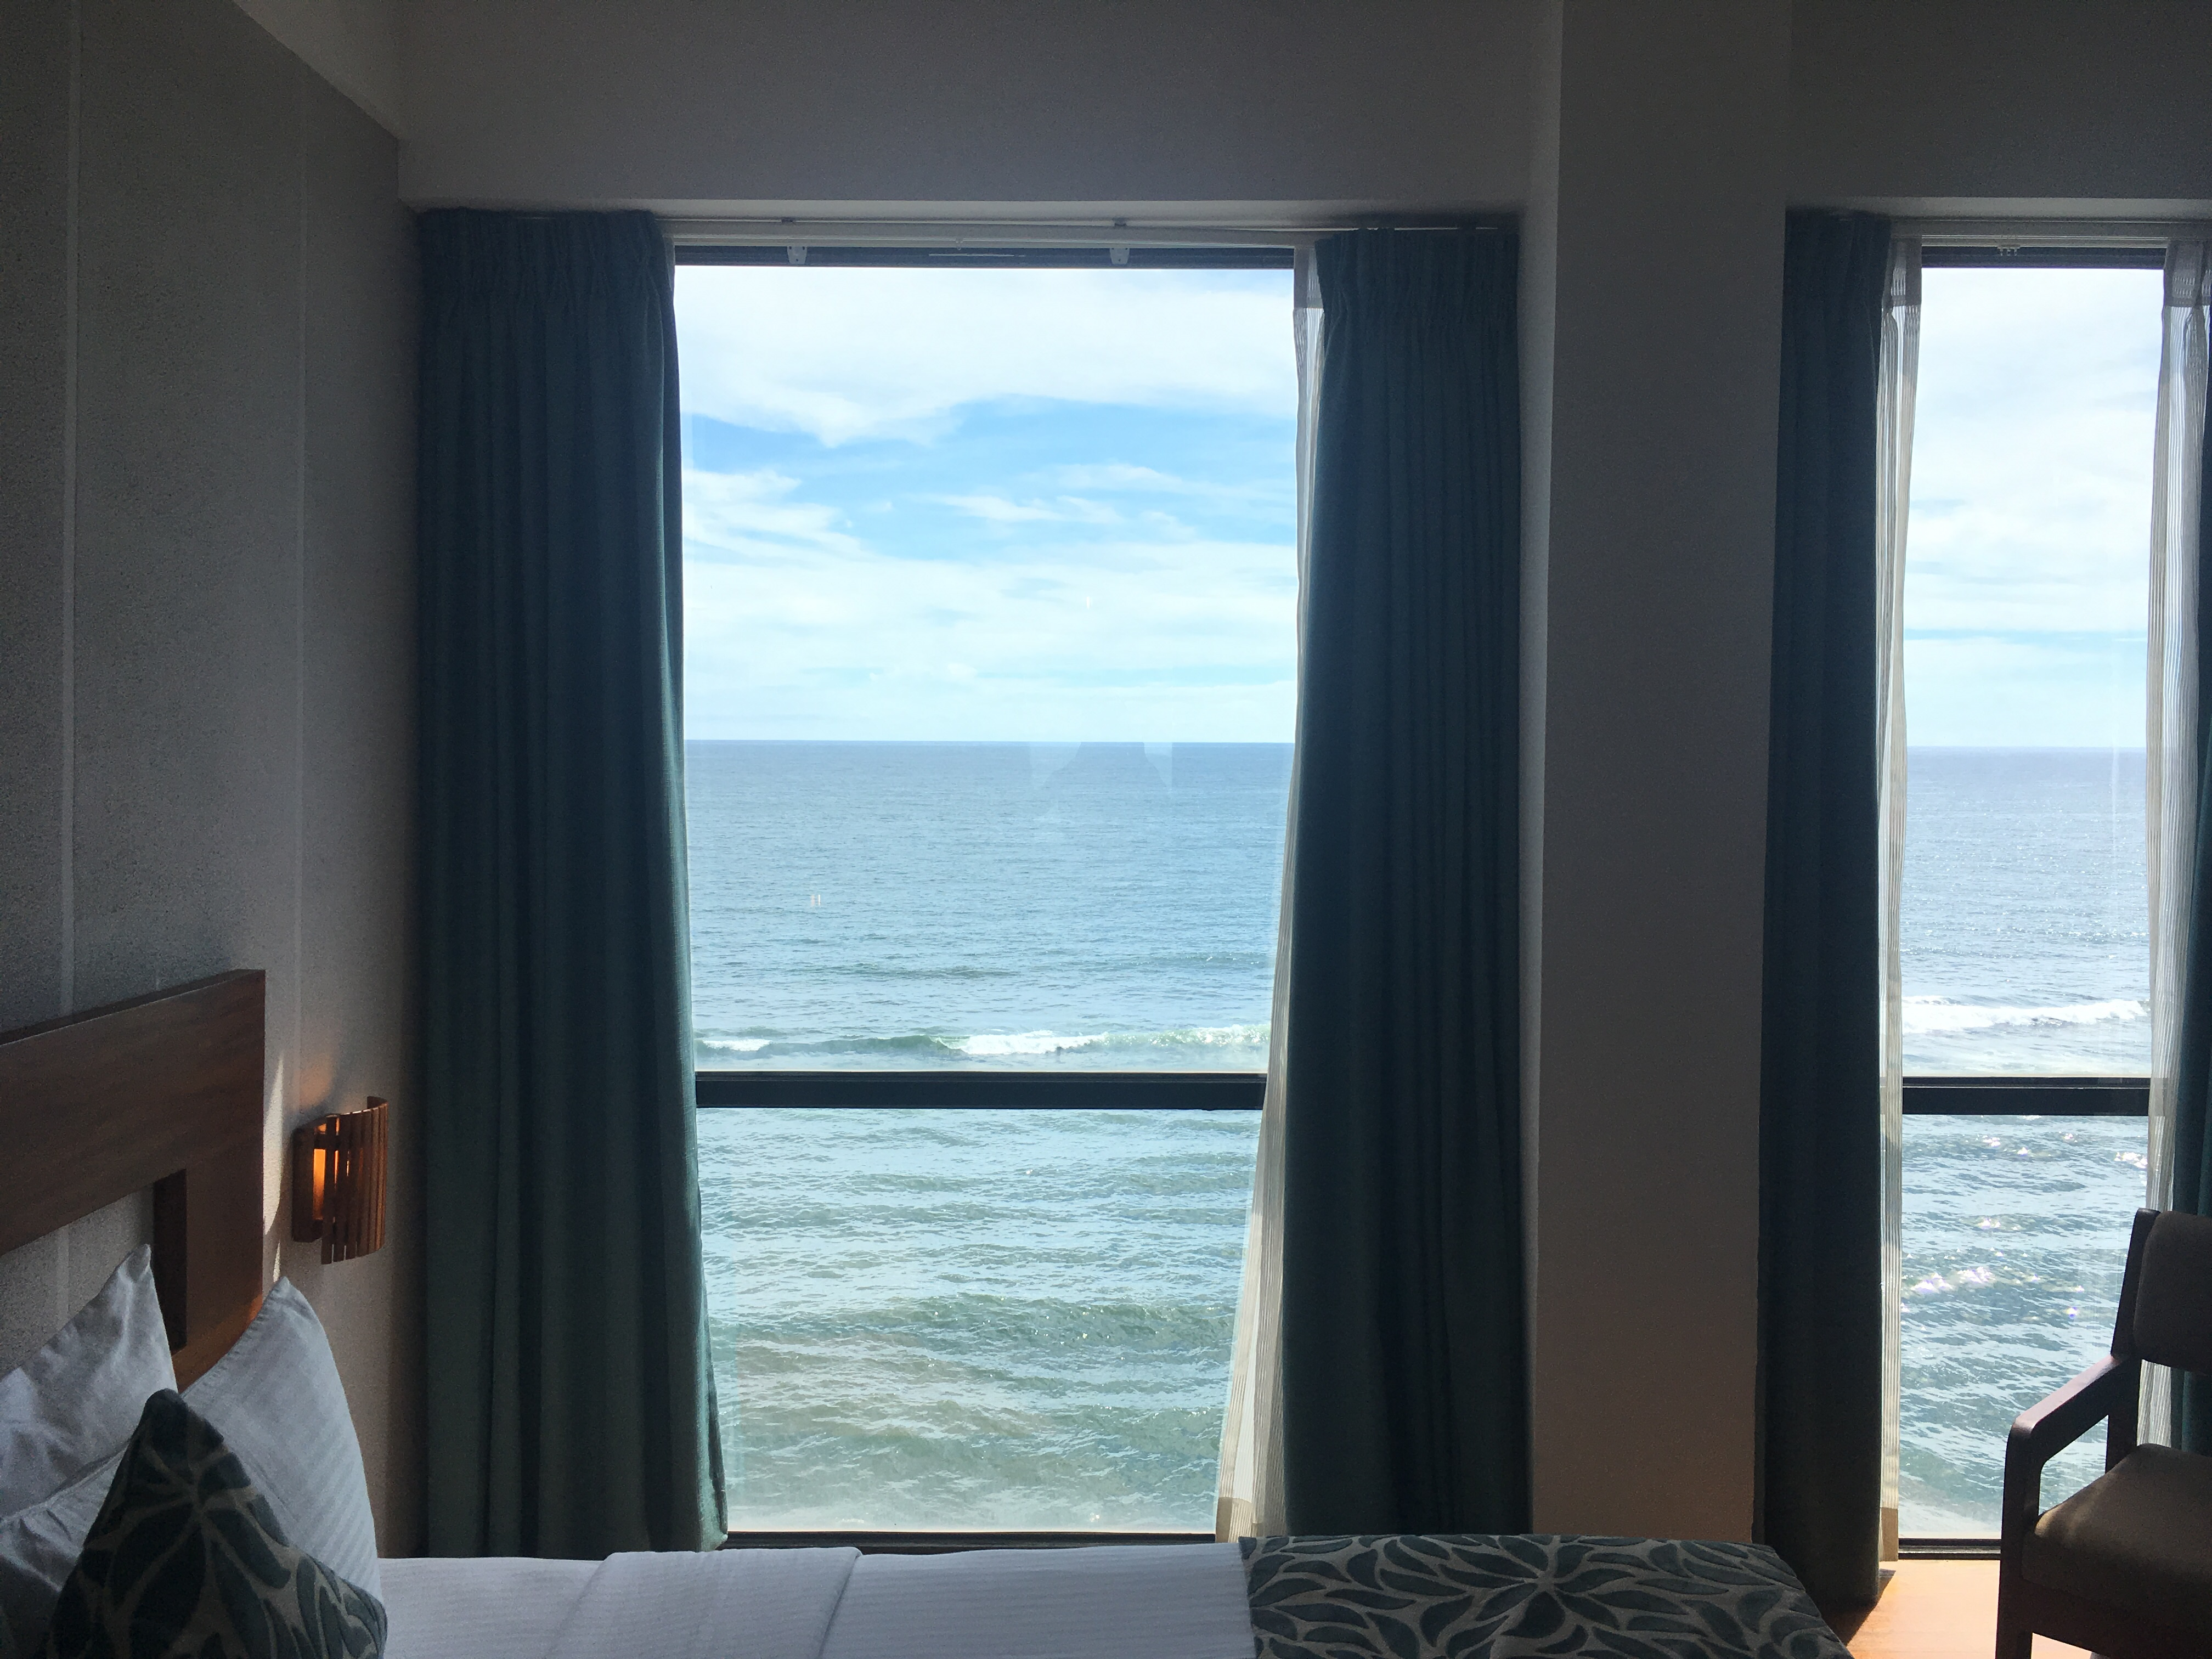 The Ocean Colombo Hotel